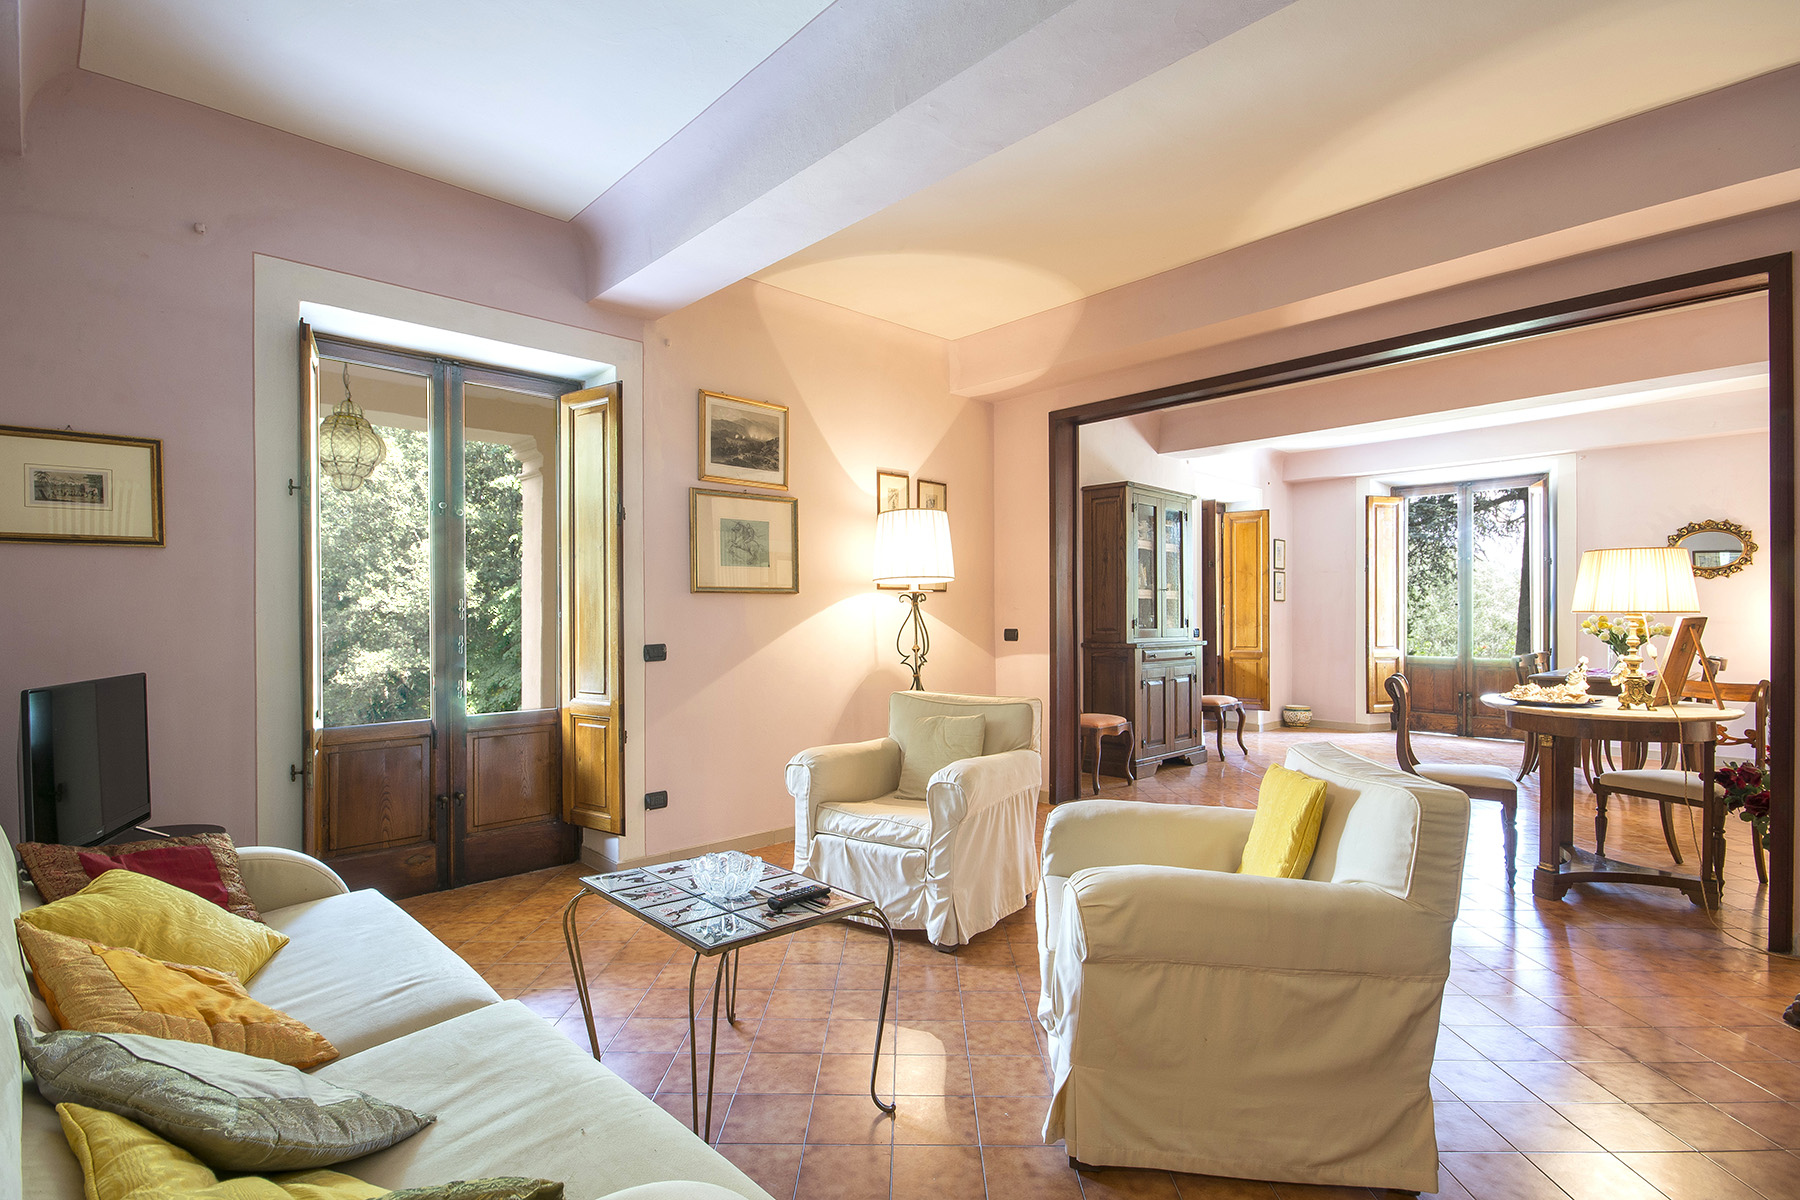 Villa in Vendita a Lucca: 5 locali, 1150 mq - Foto 5